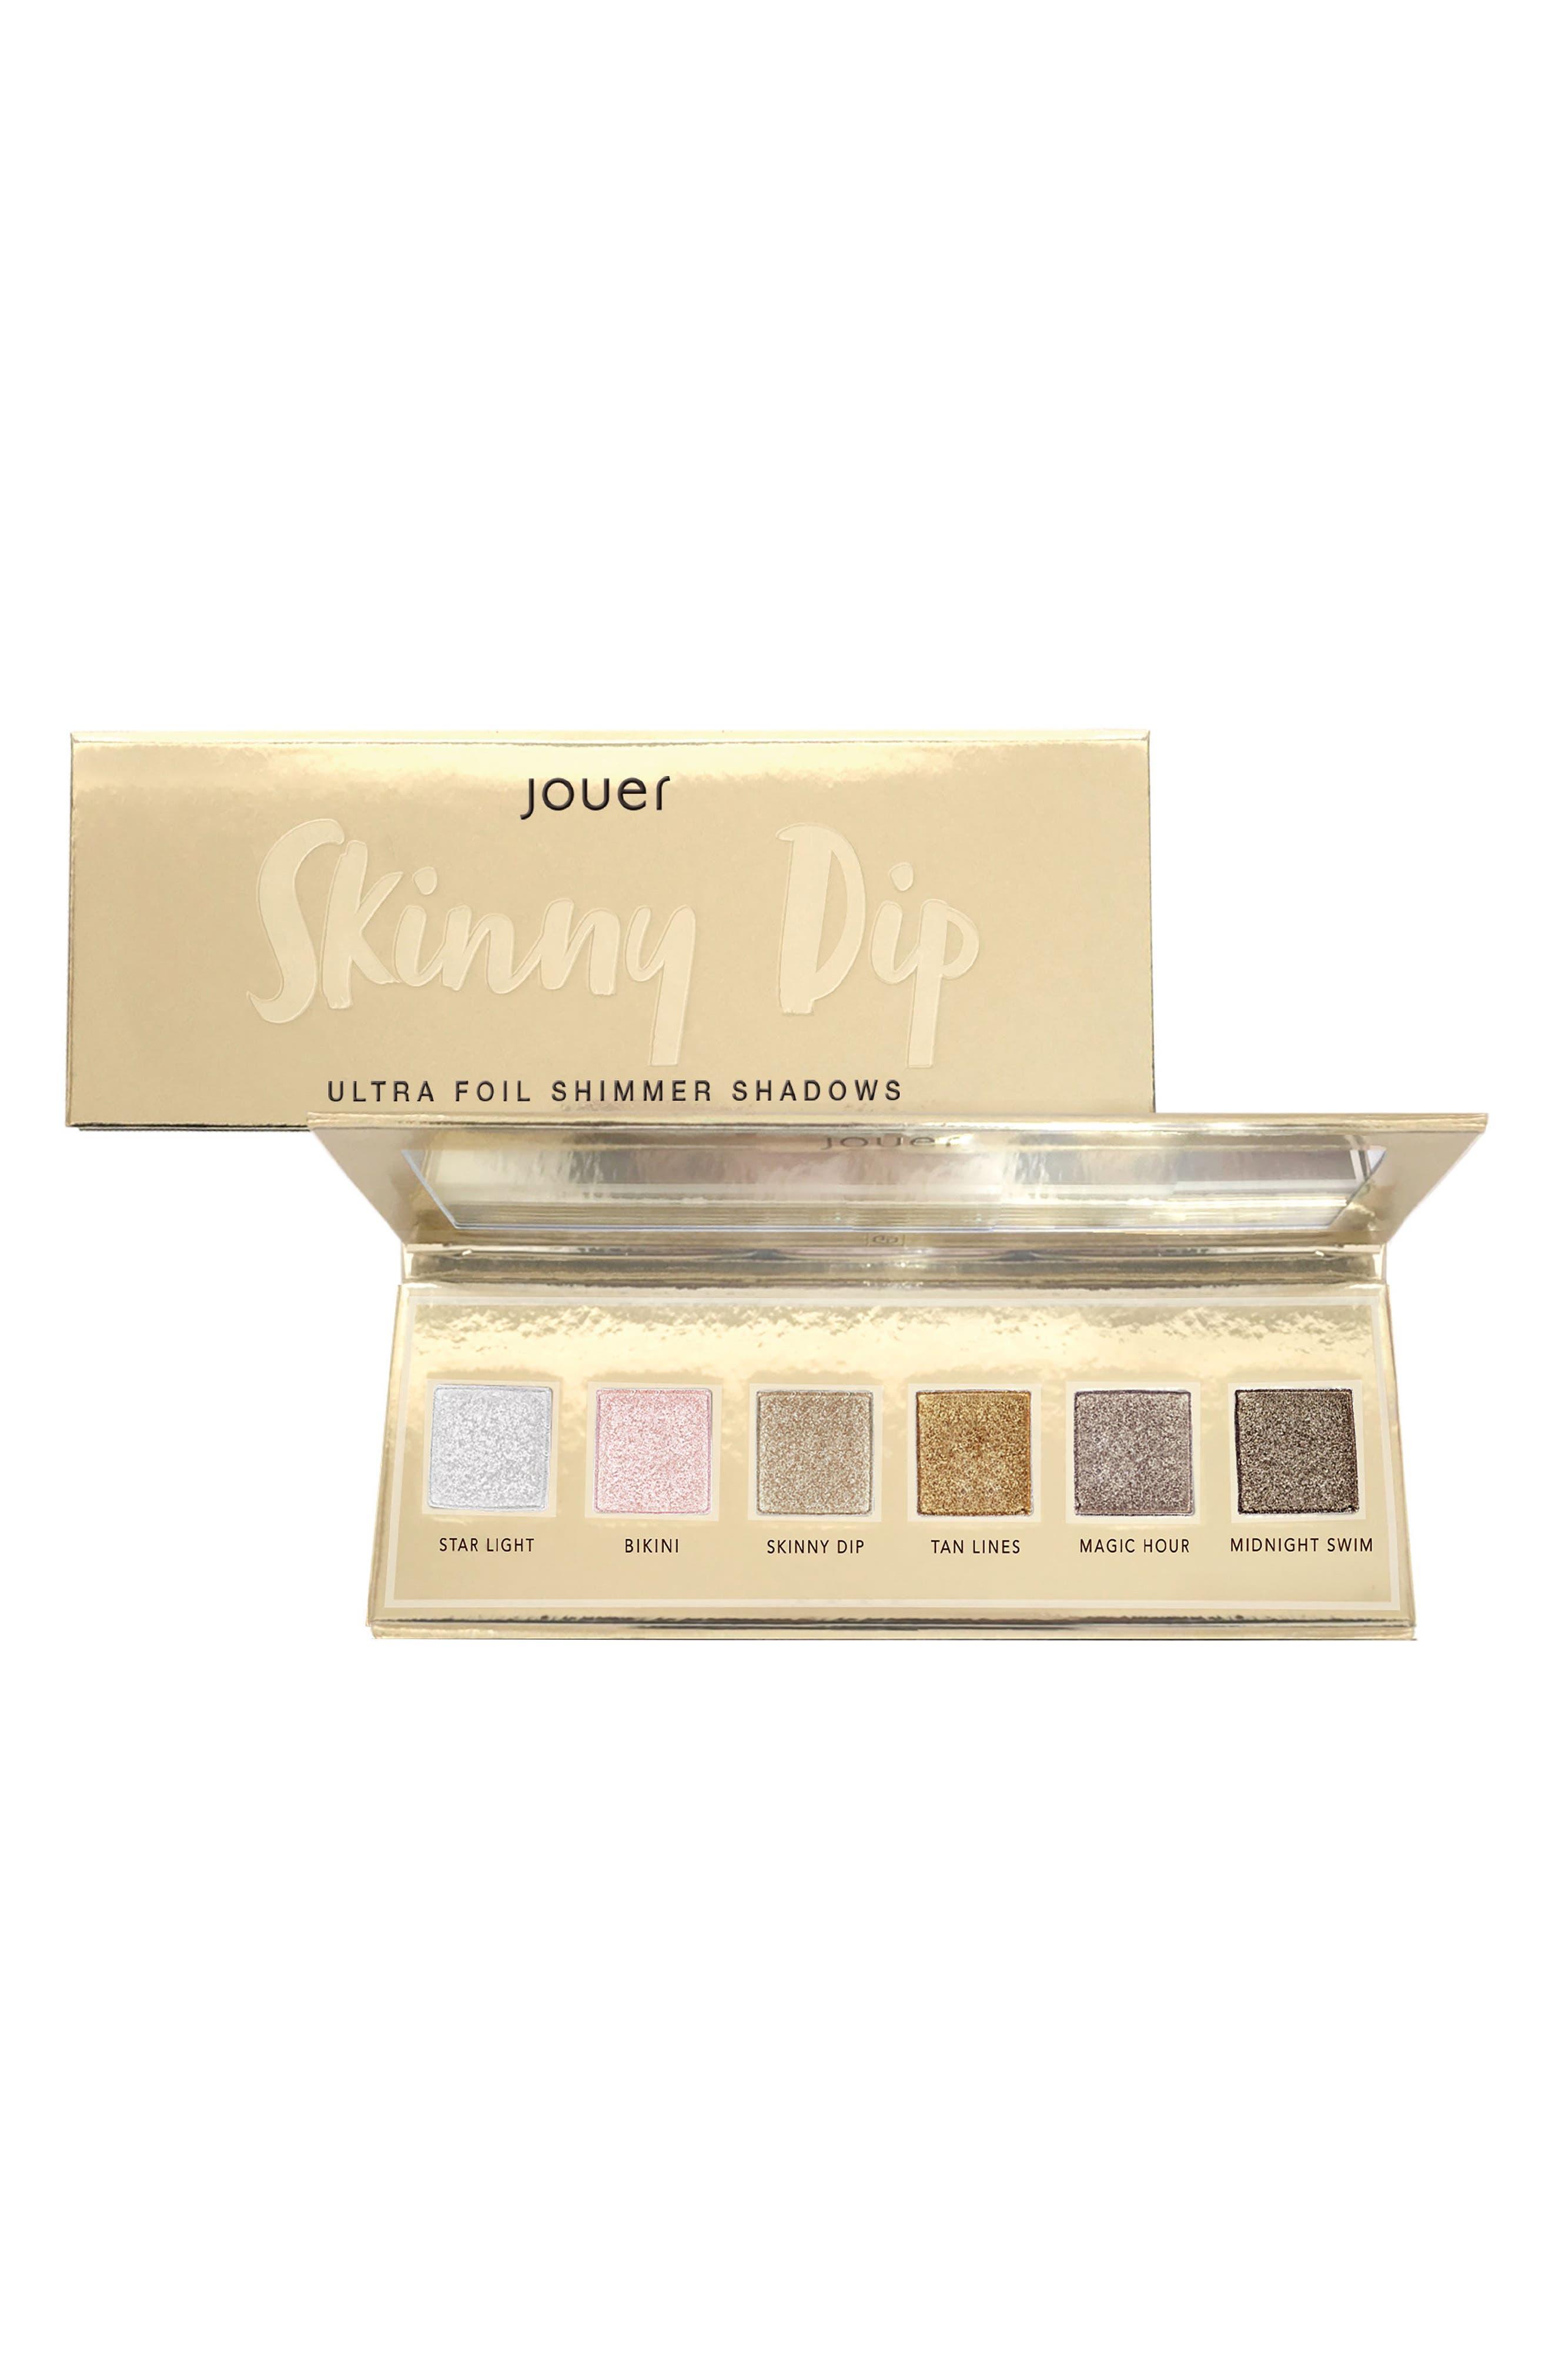 Skinny Dip Ultra Foil Shimmer Shadows Palette,                             Main thumbnail 1, color,                             NO COLOR